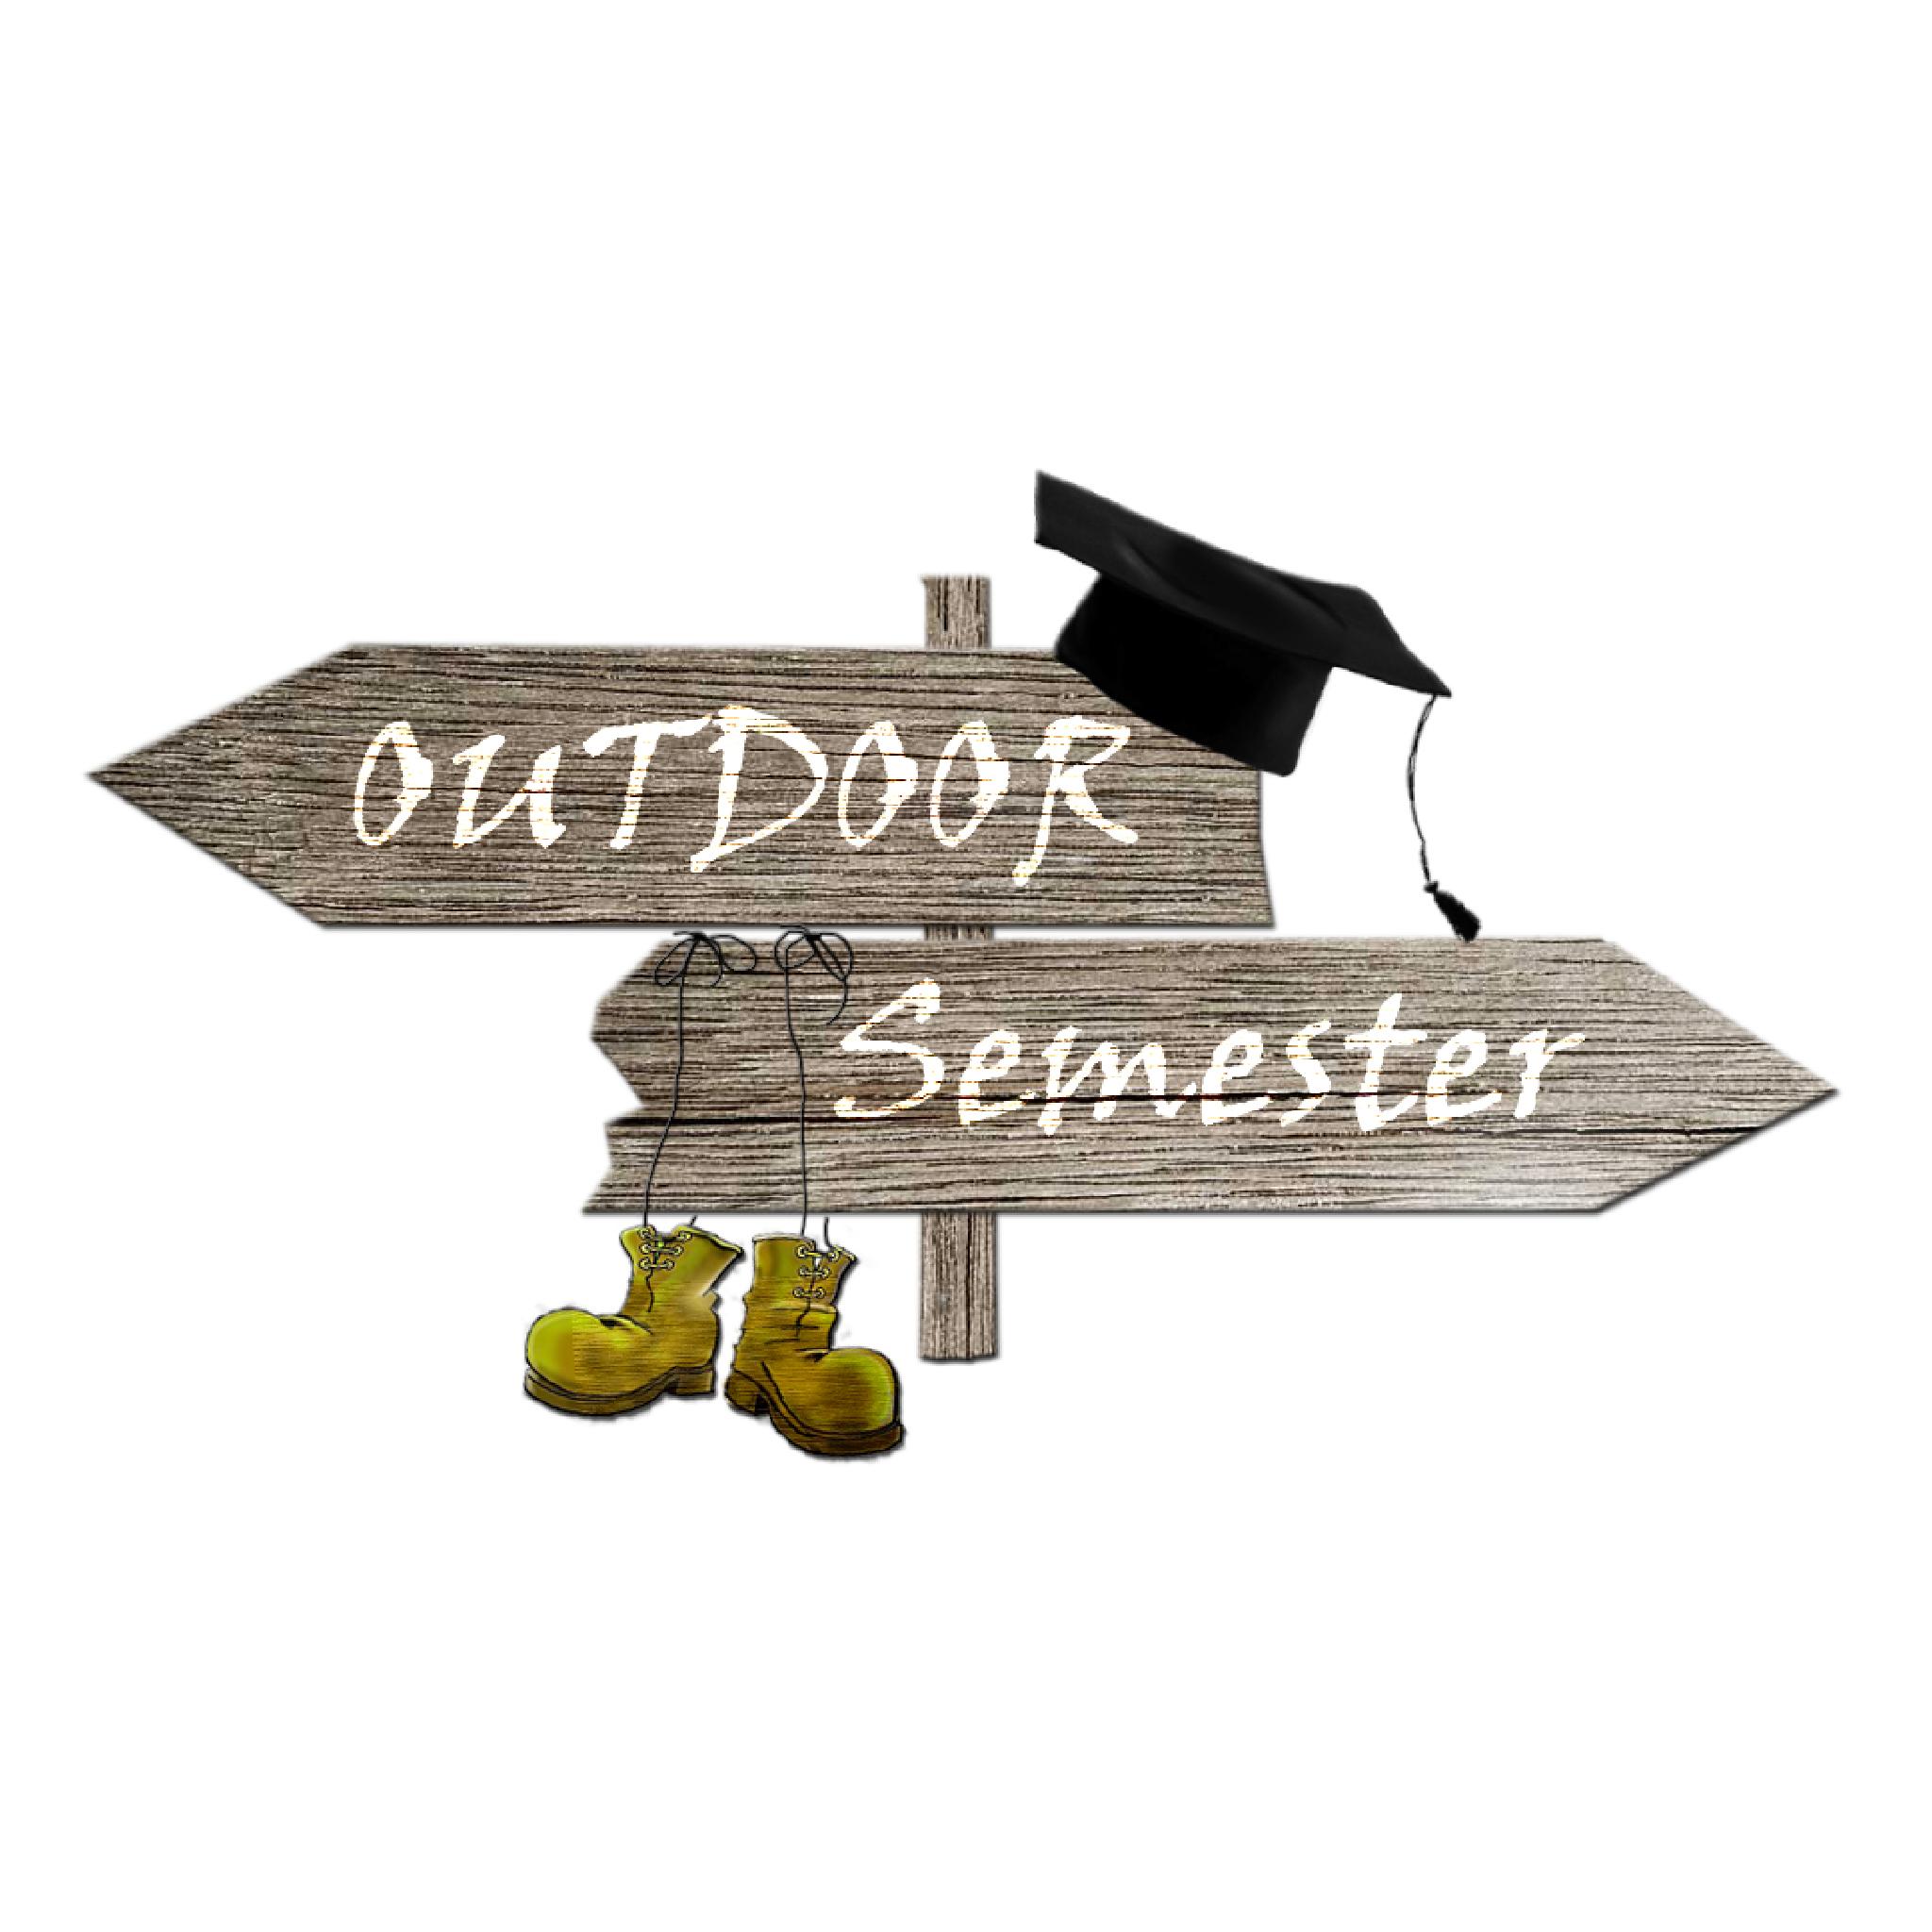 Outdoor Semester